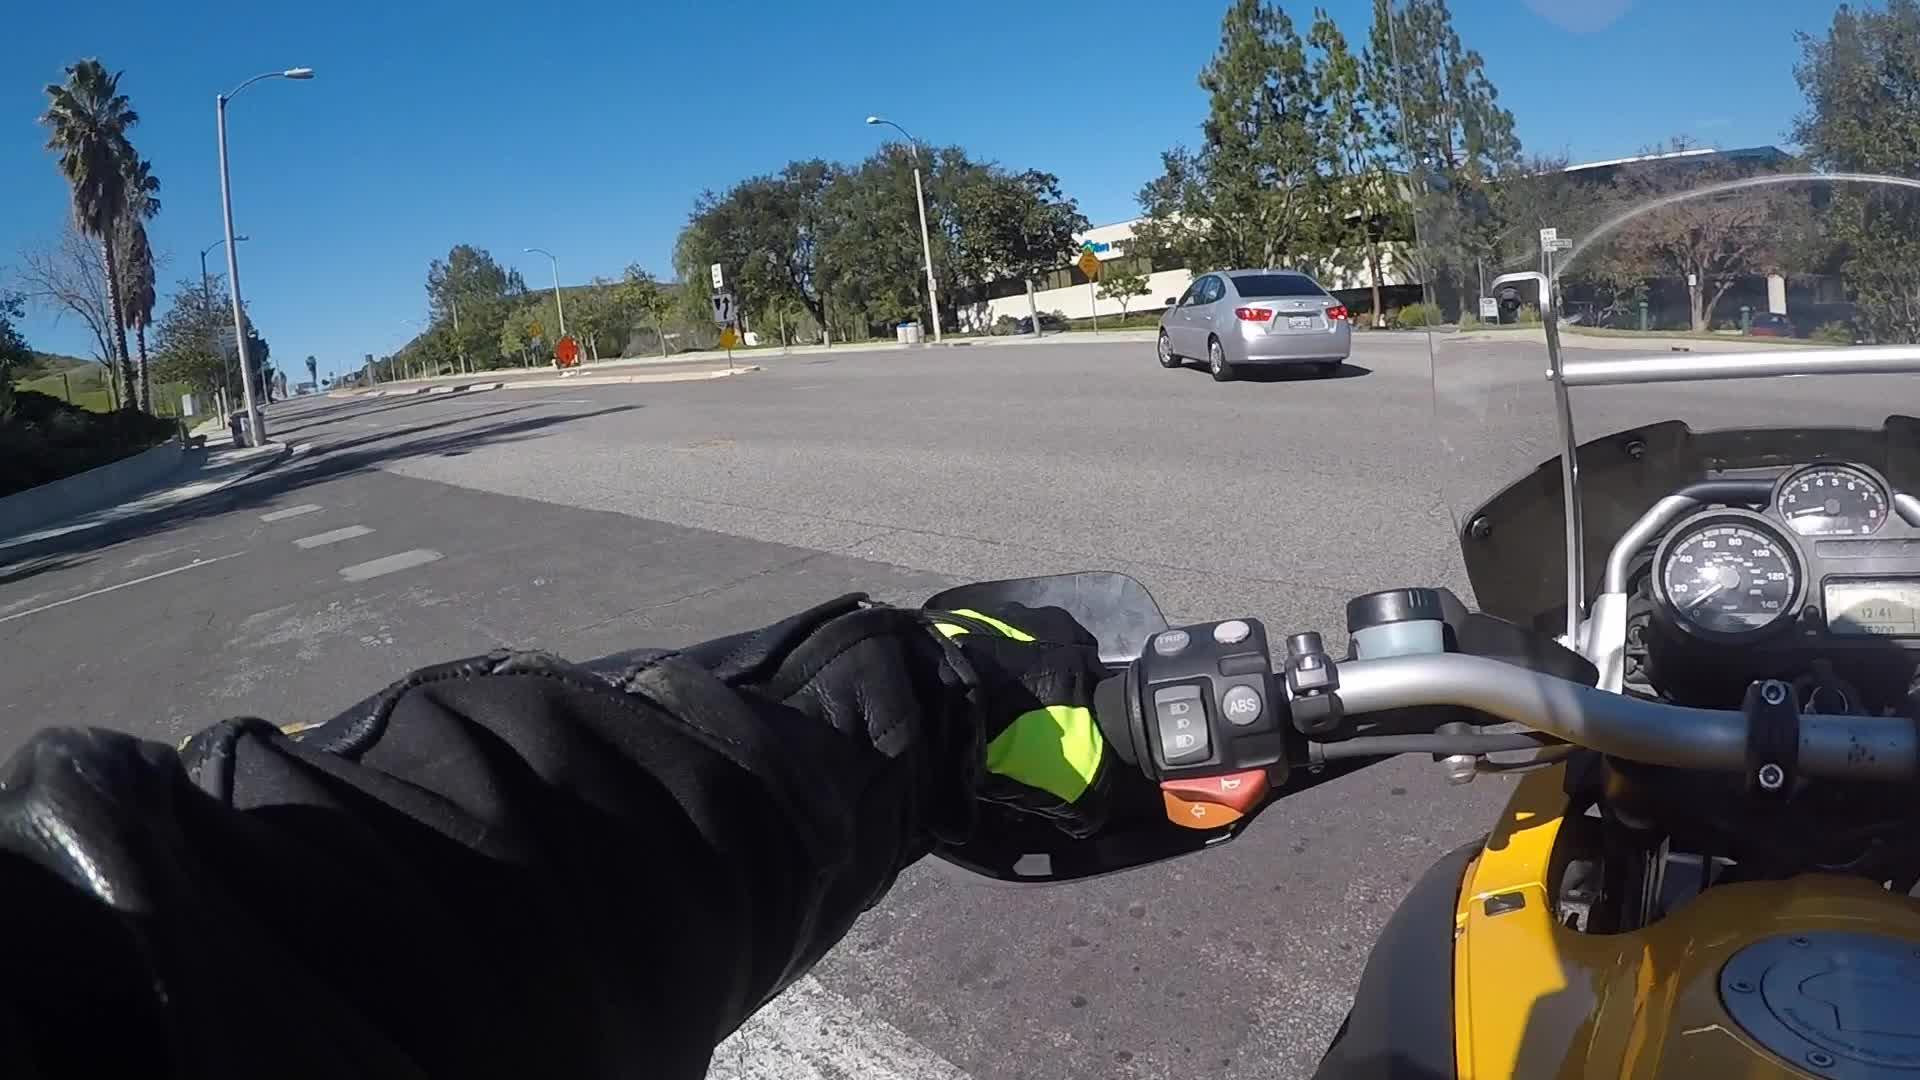 moto, motorrad, wheelie, Howdy Sheriff GIFs